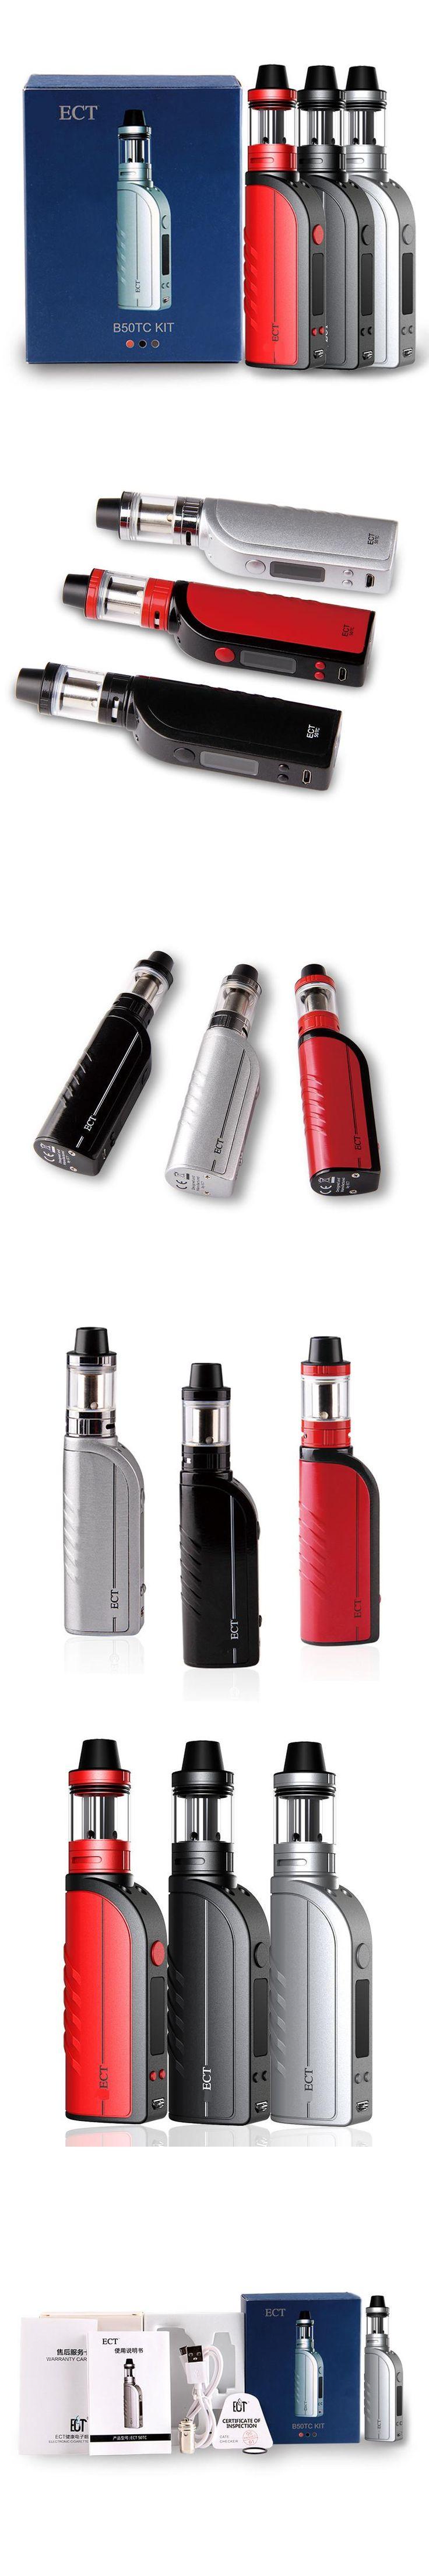 Original ECT B50 Temperature control starter kits e cigarette vaporizer mod vape mod atomizer 2200mah electronic cigarette